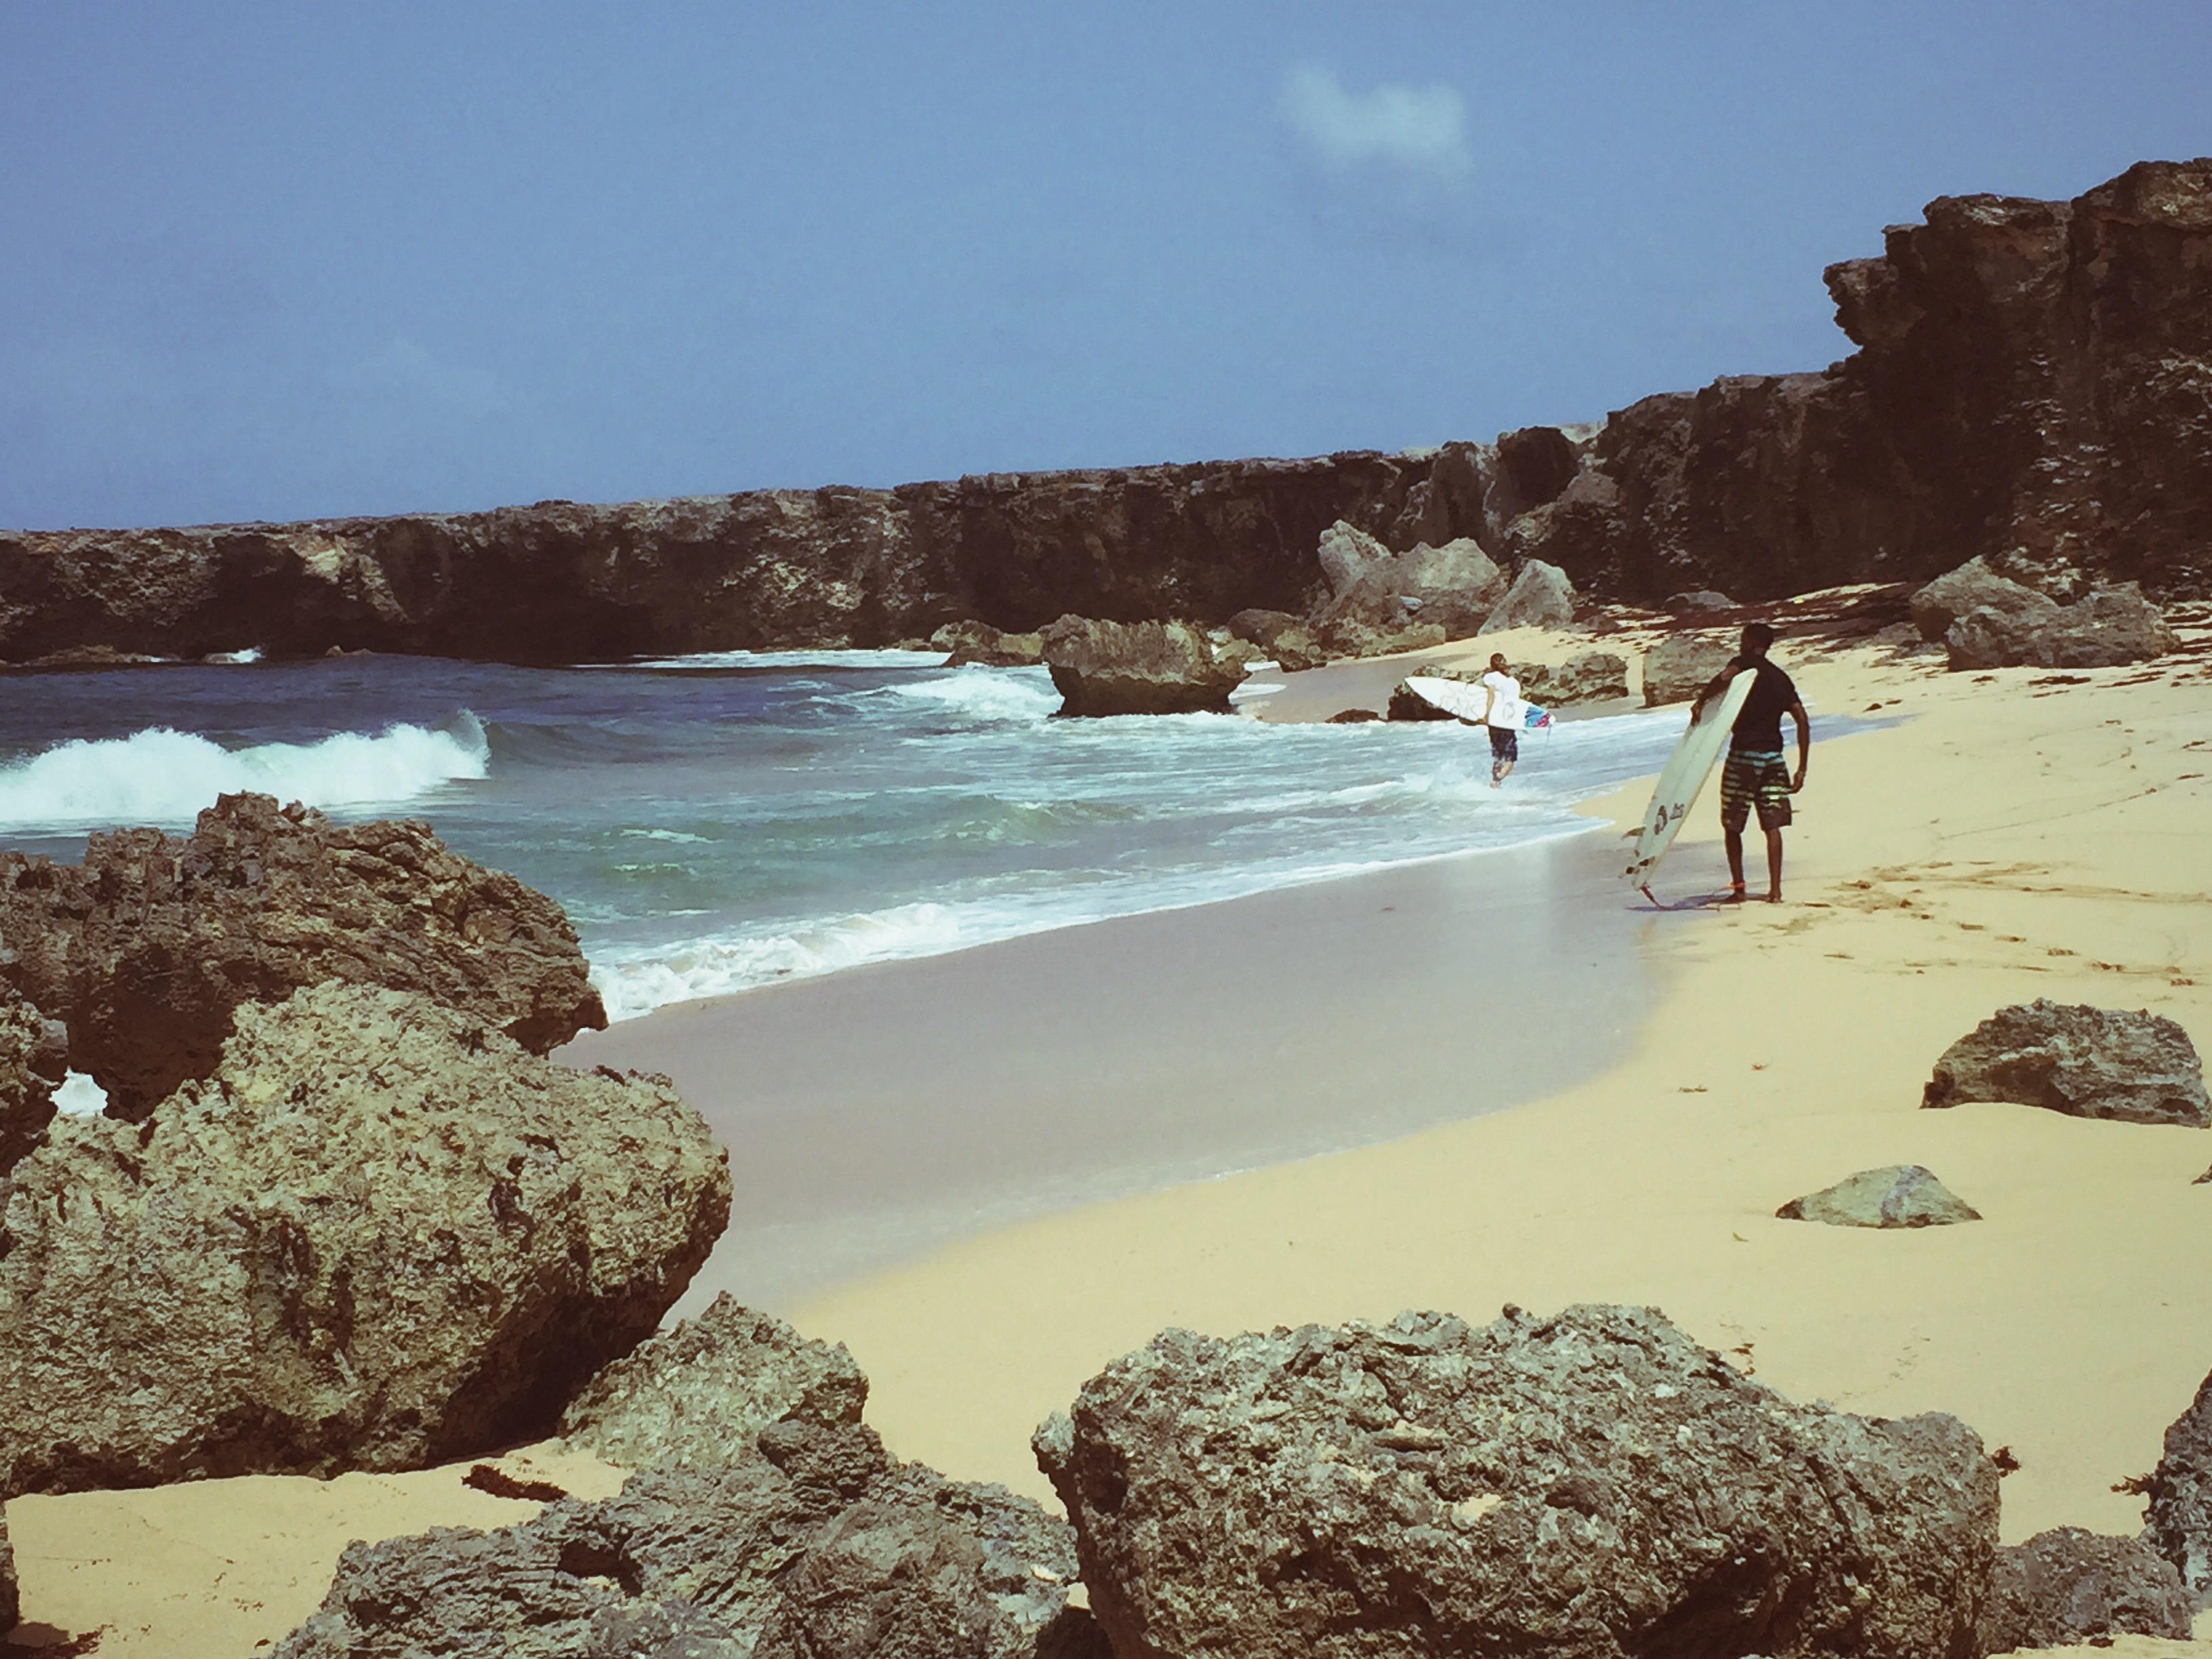 Beach scene with surfers